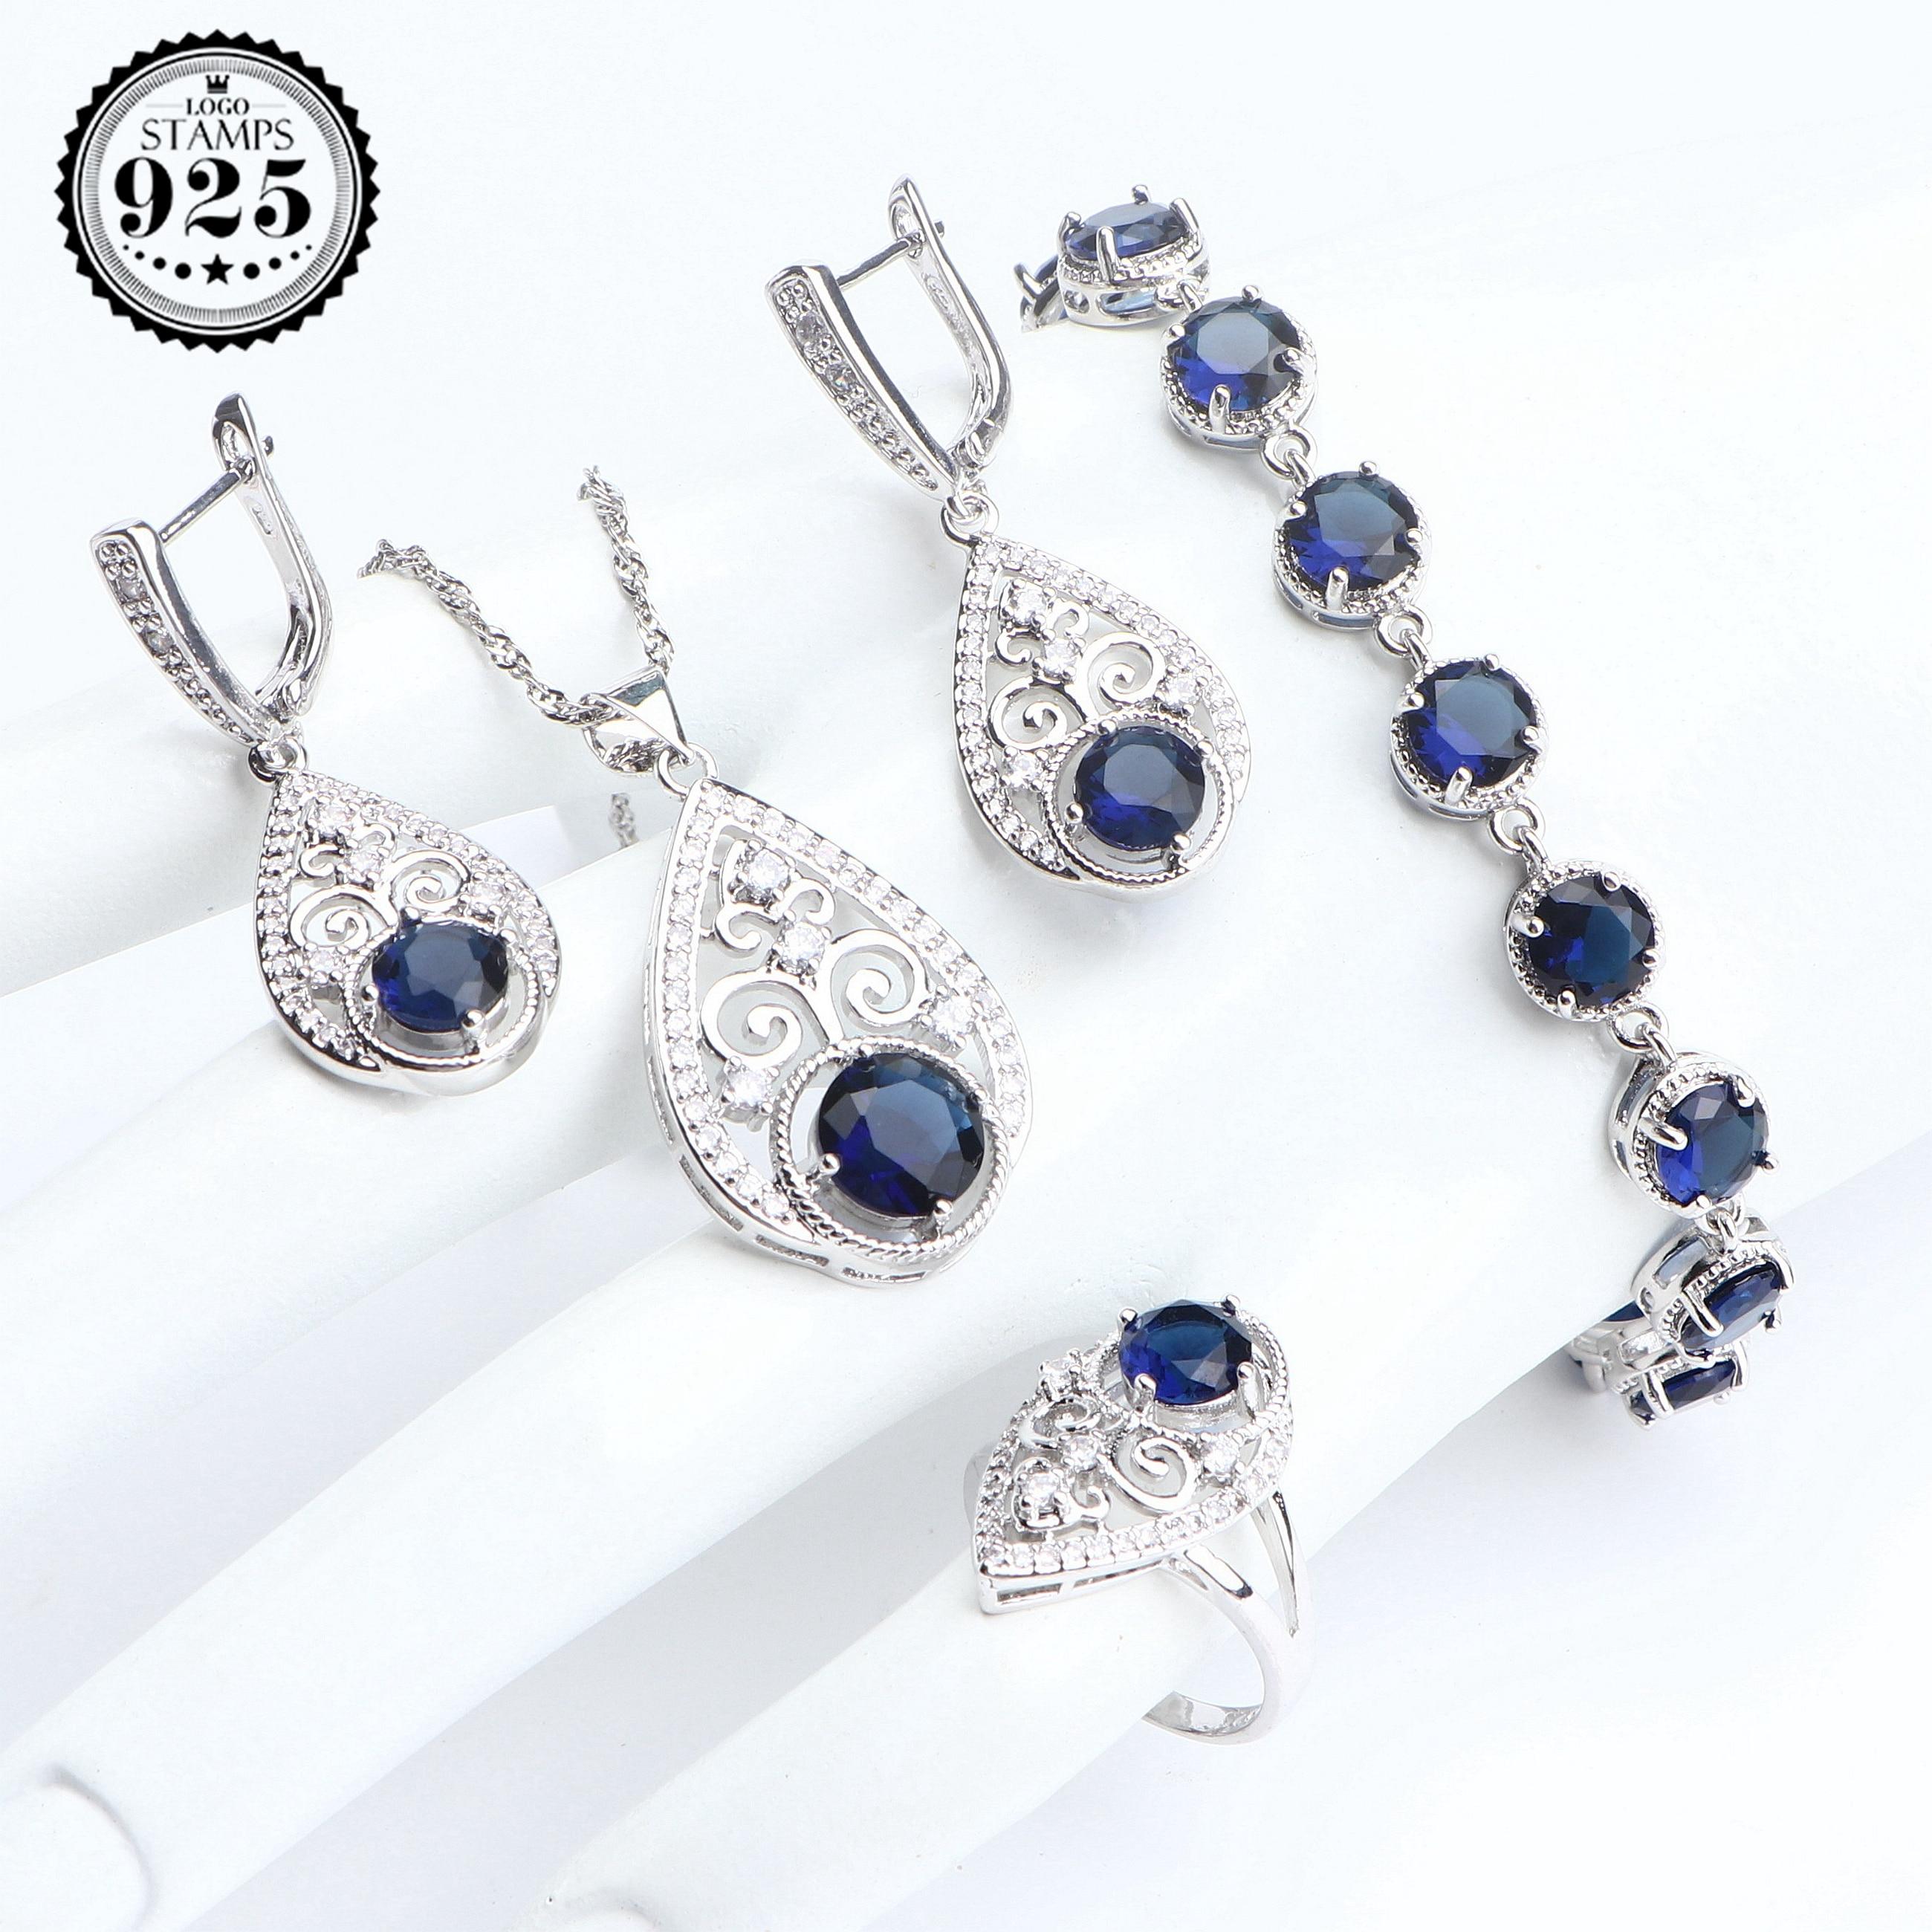 Conjuntos de joyería de plata de circón azul 925, pendientes para mujer, joyería de boda, brazalete de piedra, anillo, conjunto de colgante de collar